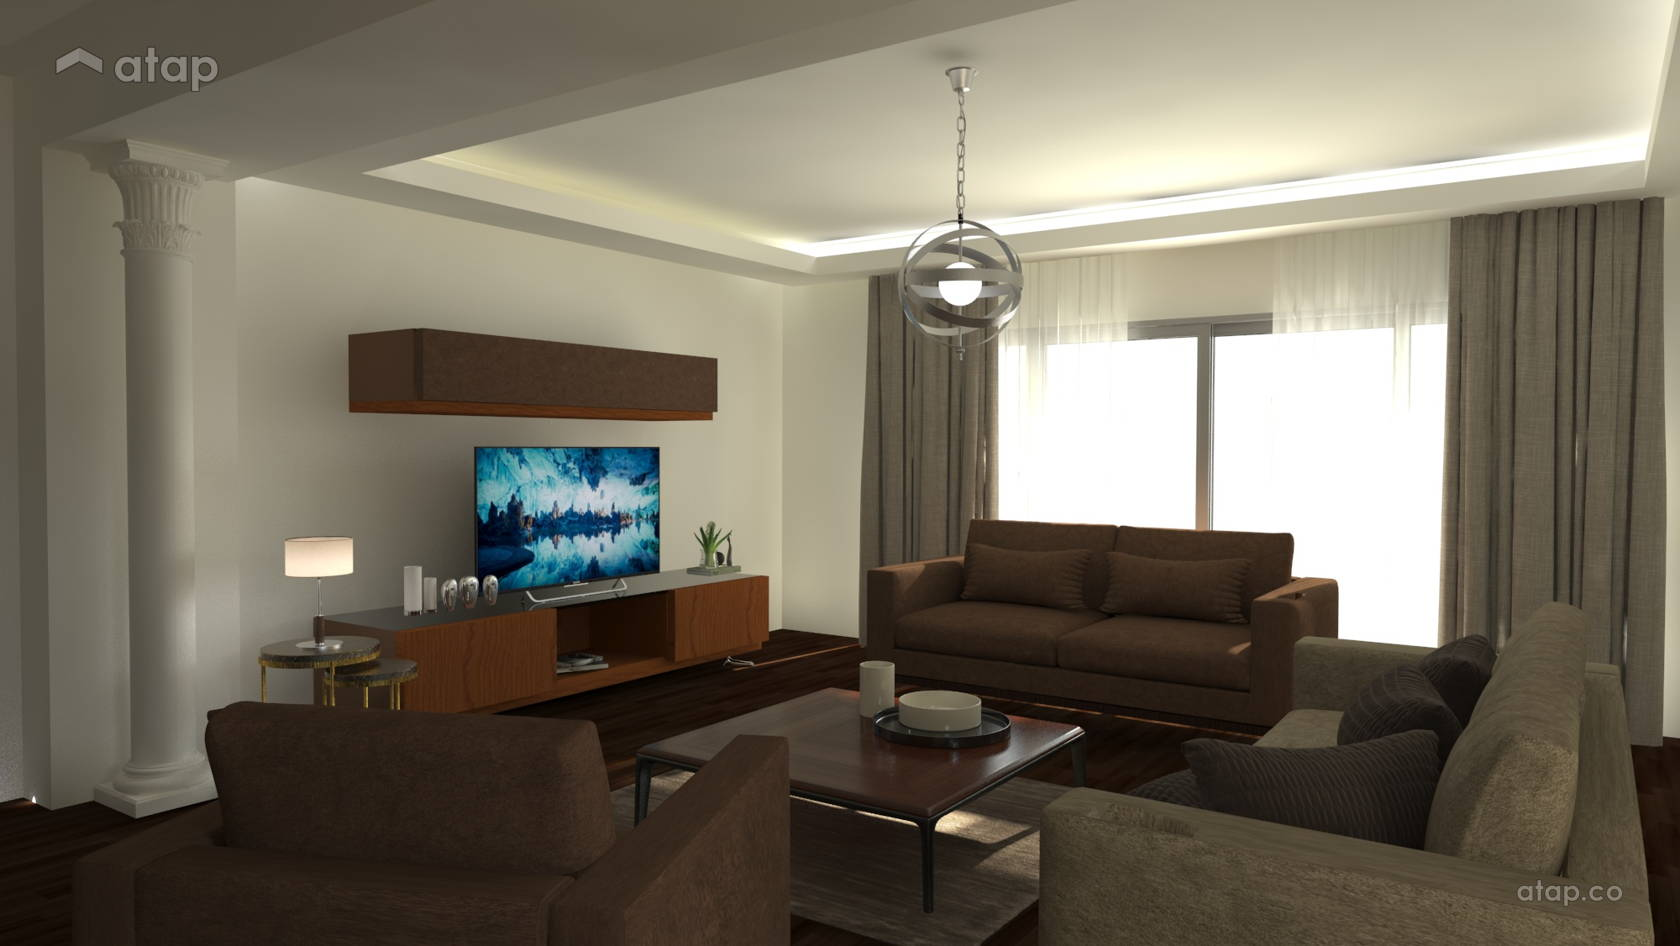 Classic Modern Living Room Apartment Design Ideas Photos Malaysia Atap Co